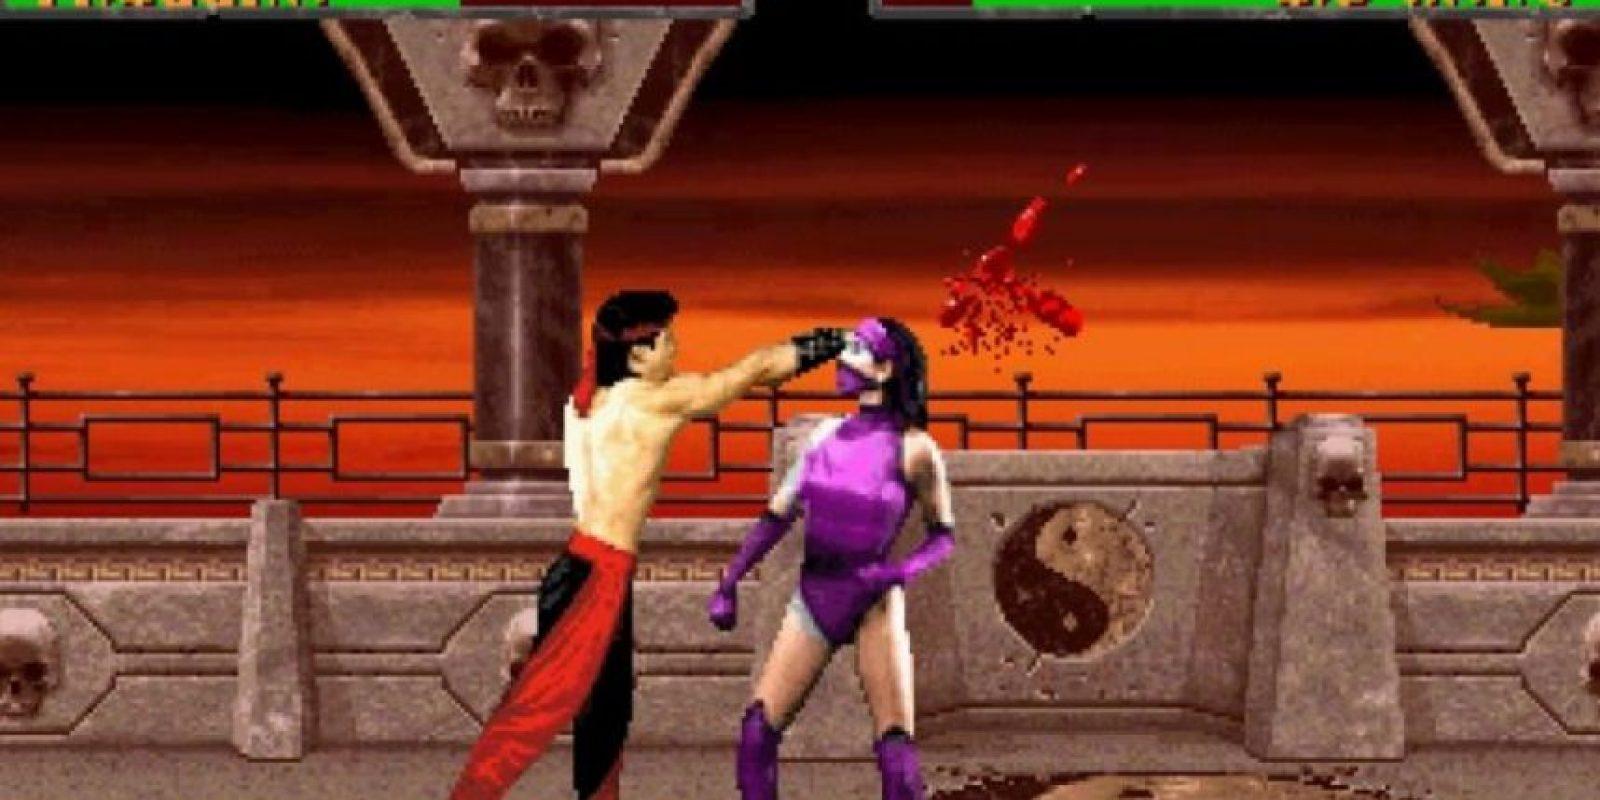 Mortal Kombat II (1993) Foto:Midway / Acclaim